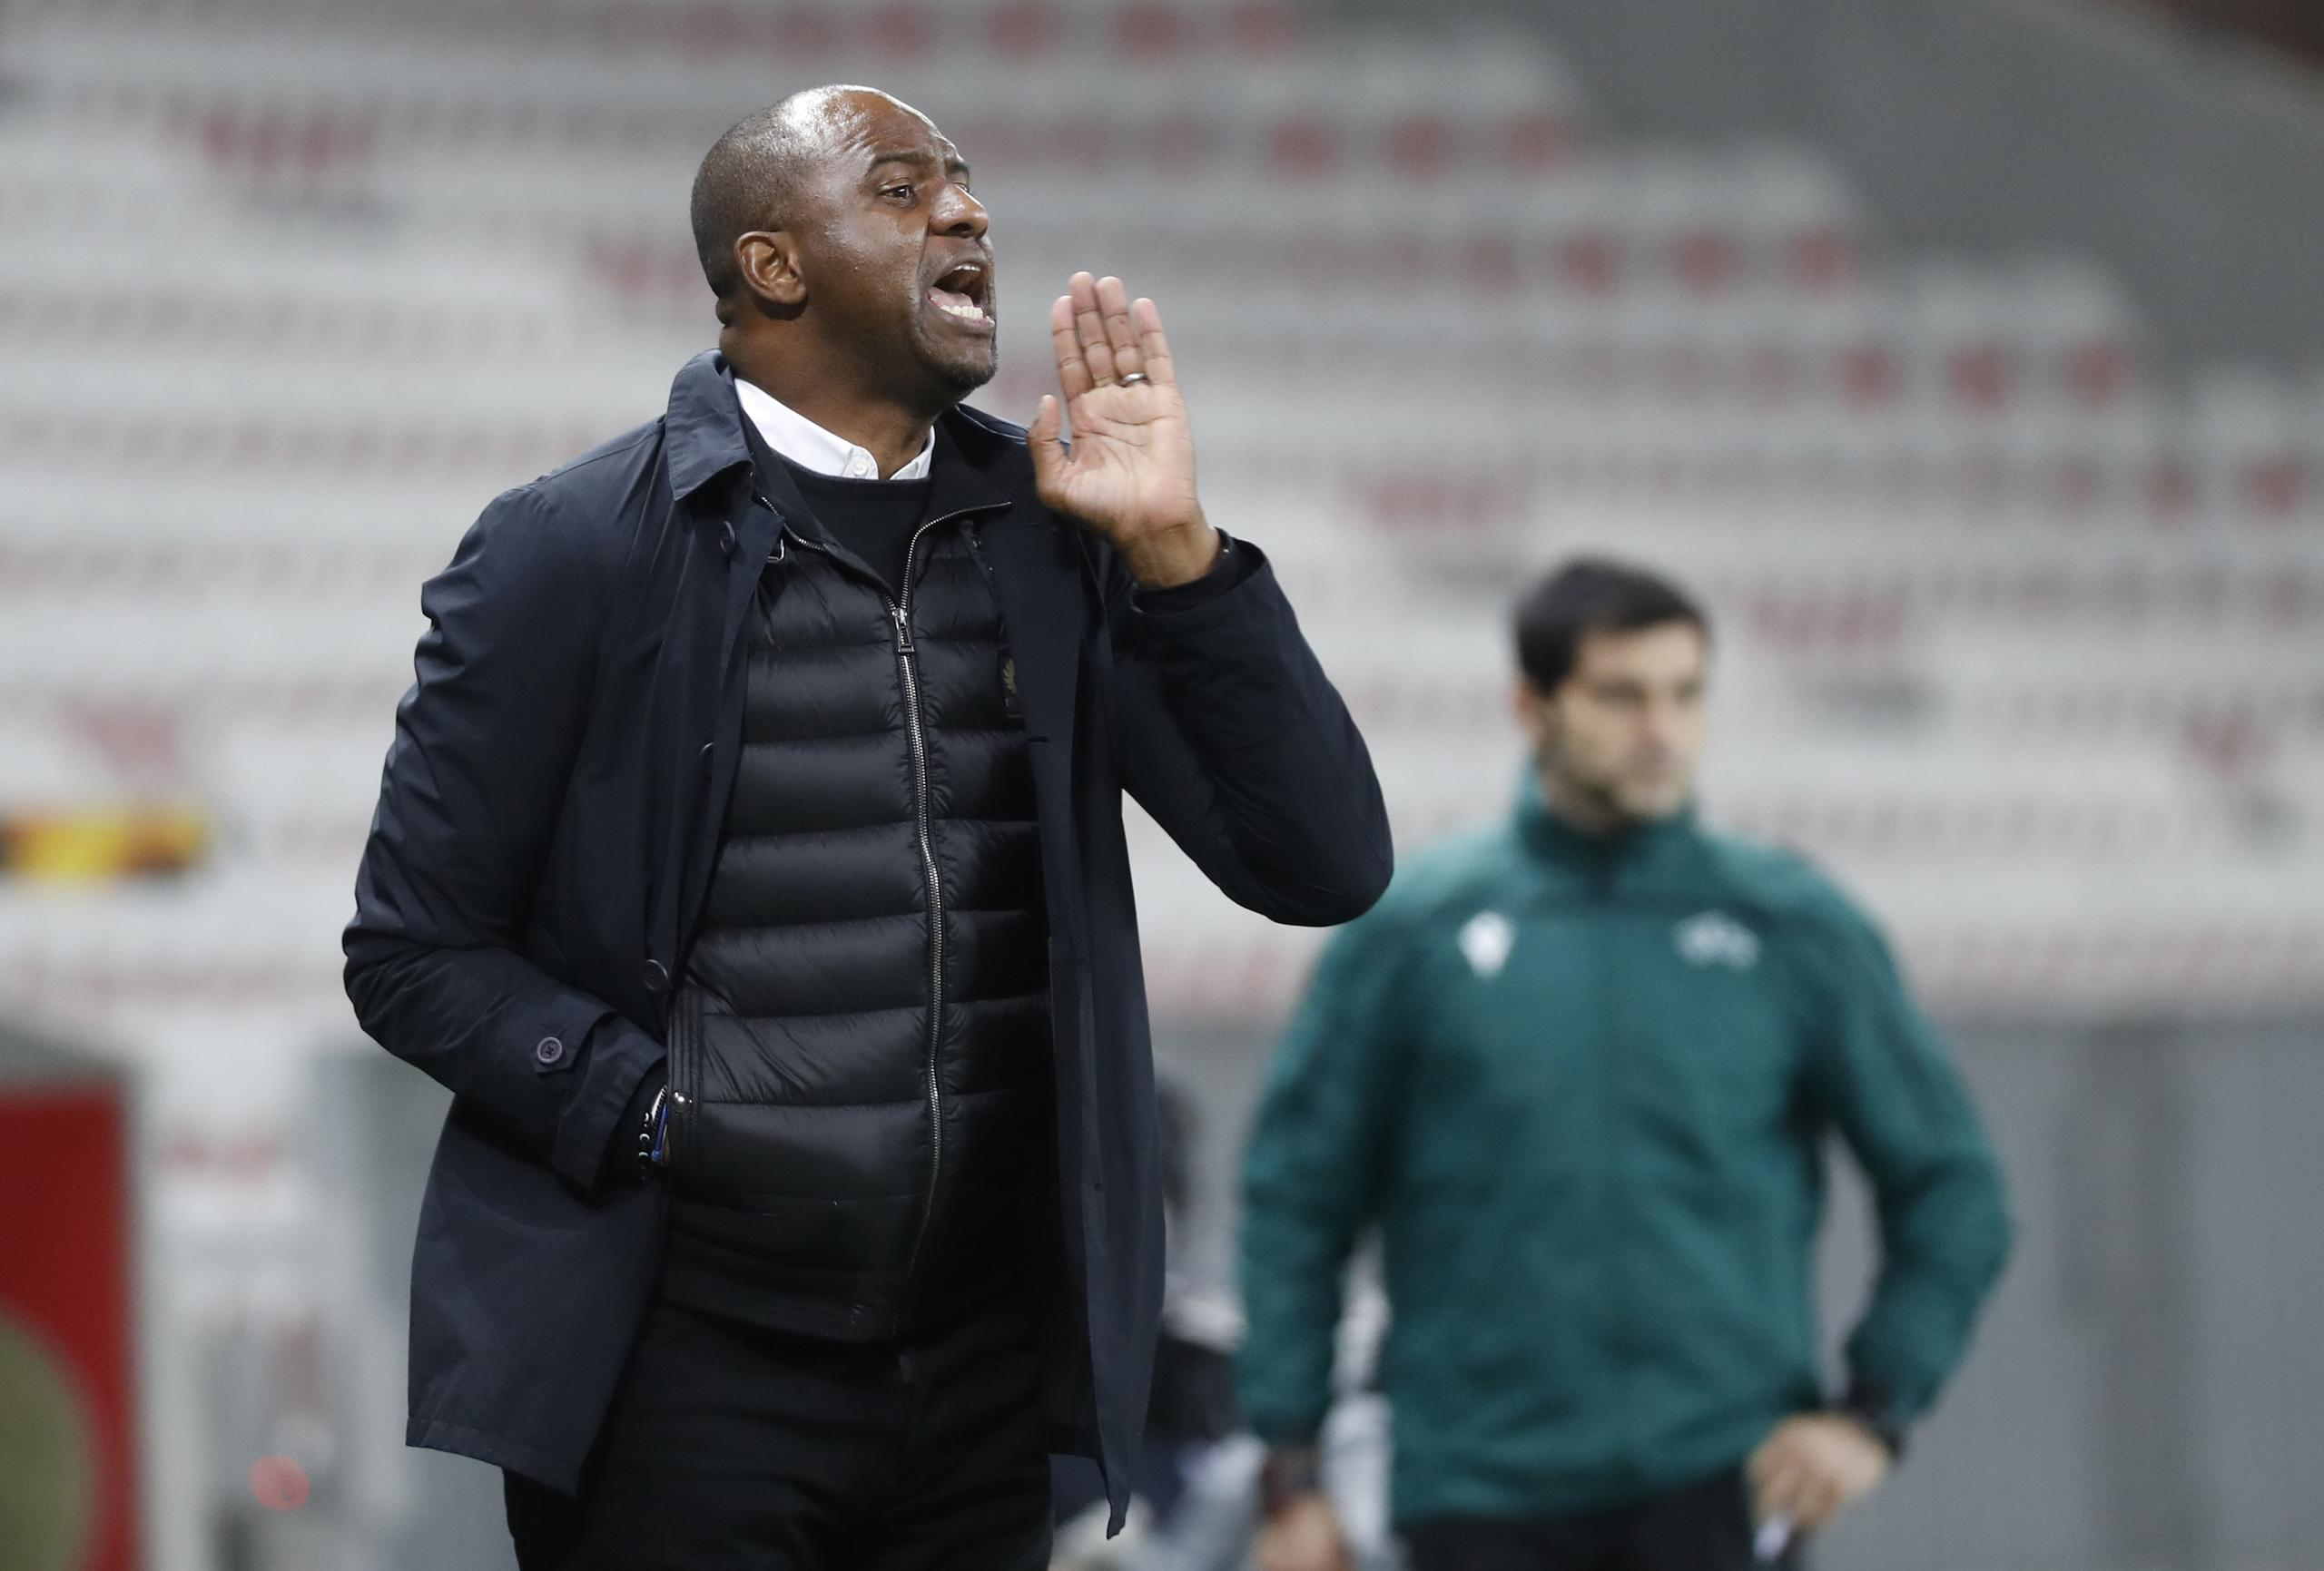 Franske legendaren tar över Premier League-klubb